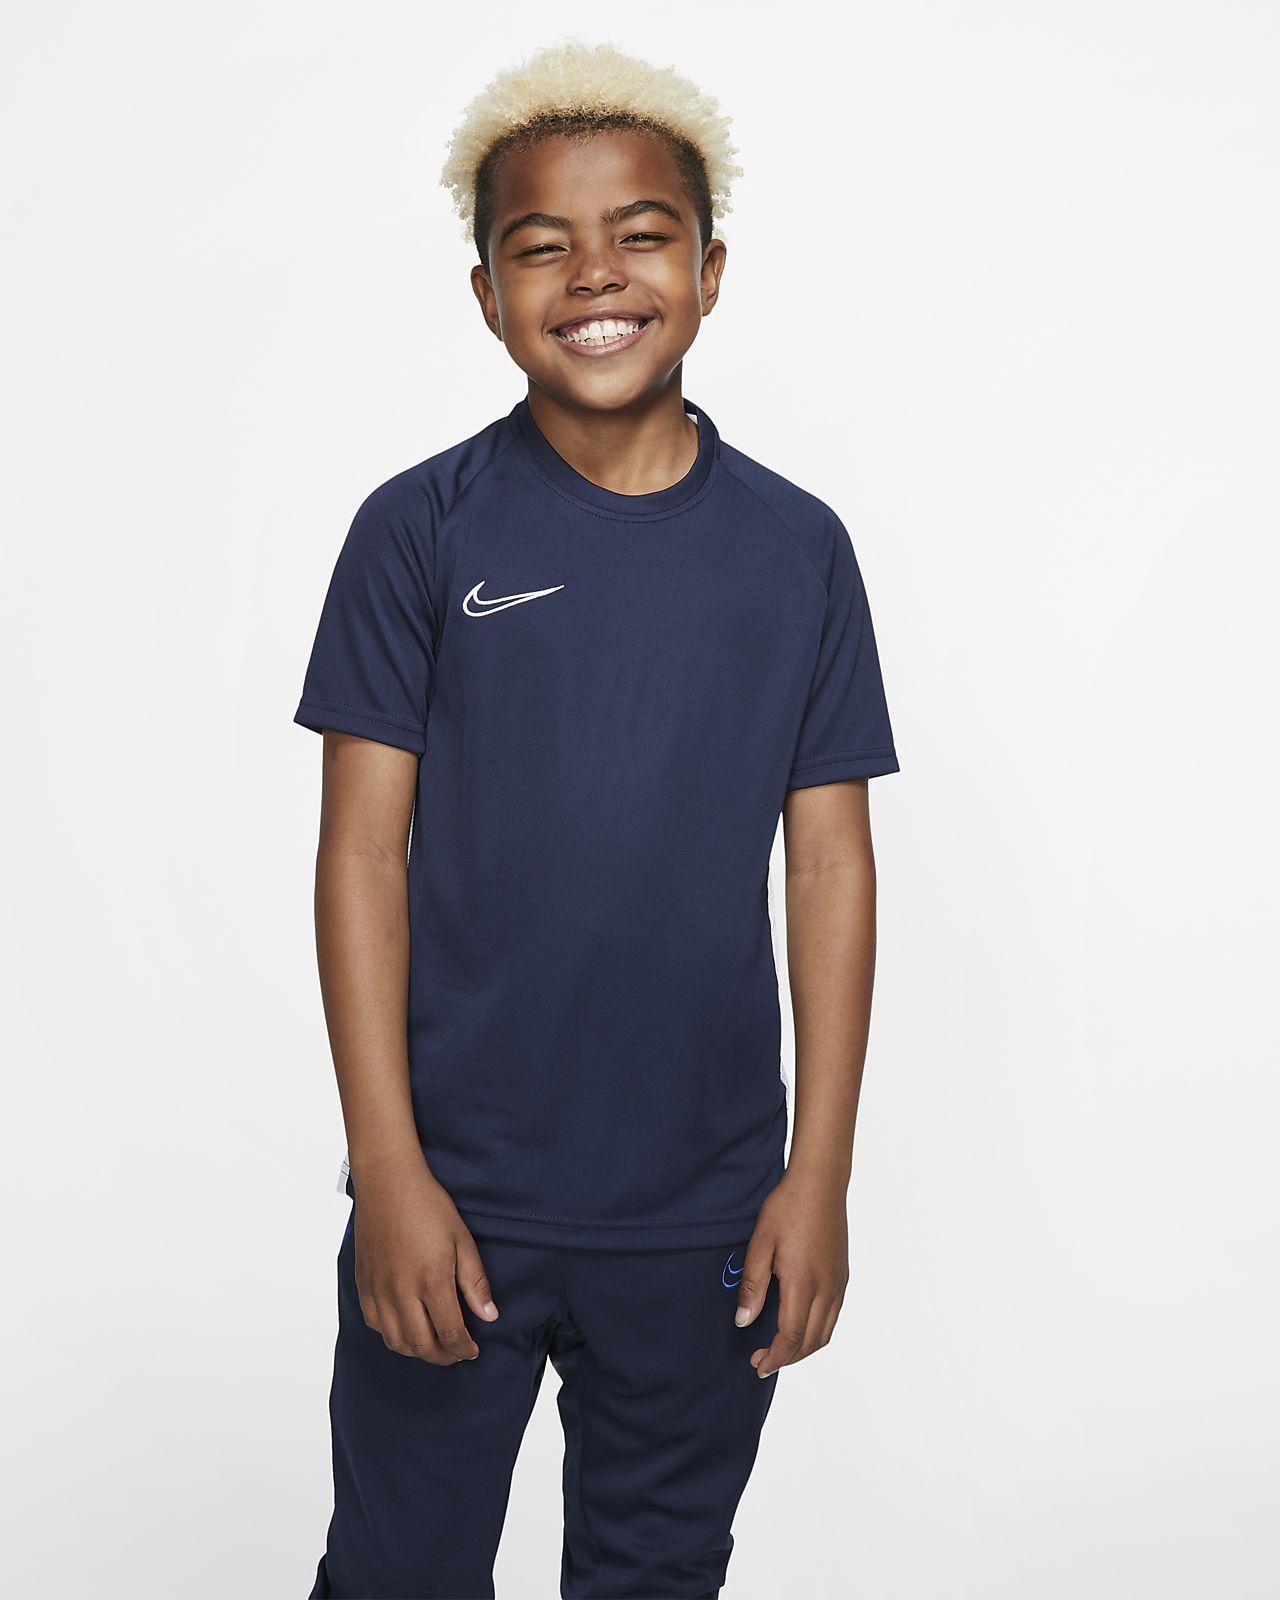 Camisola de futebol de manga curta Nike Dri-FIT Academy Júnior